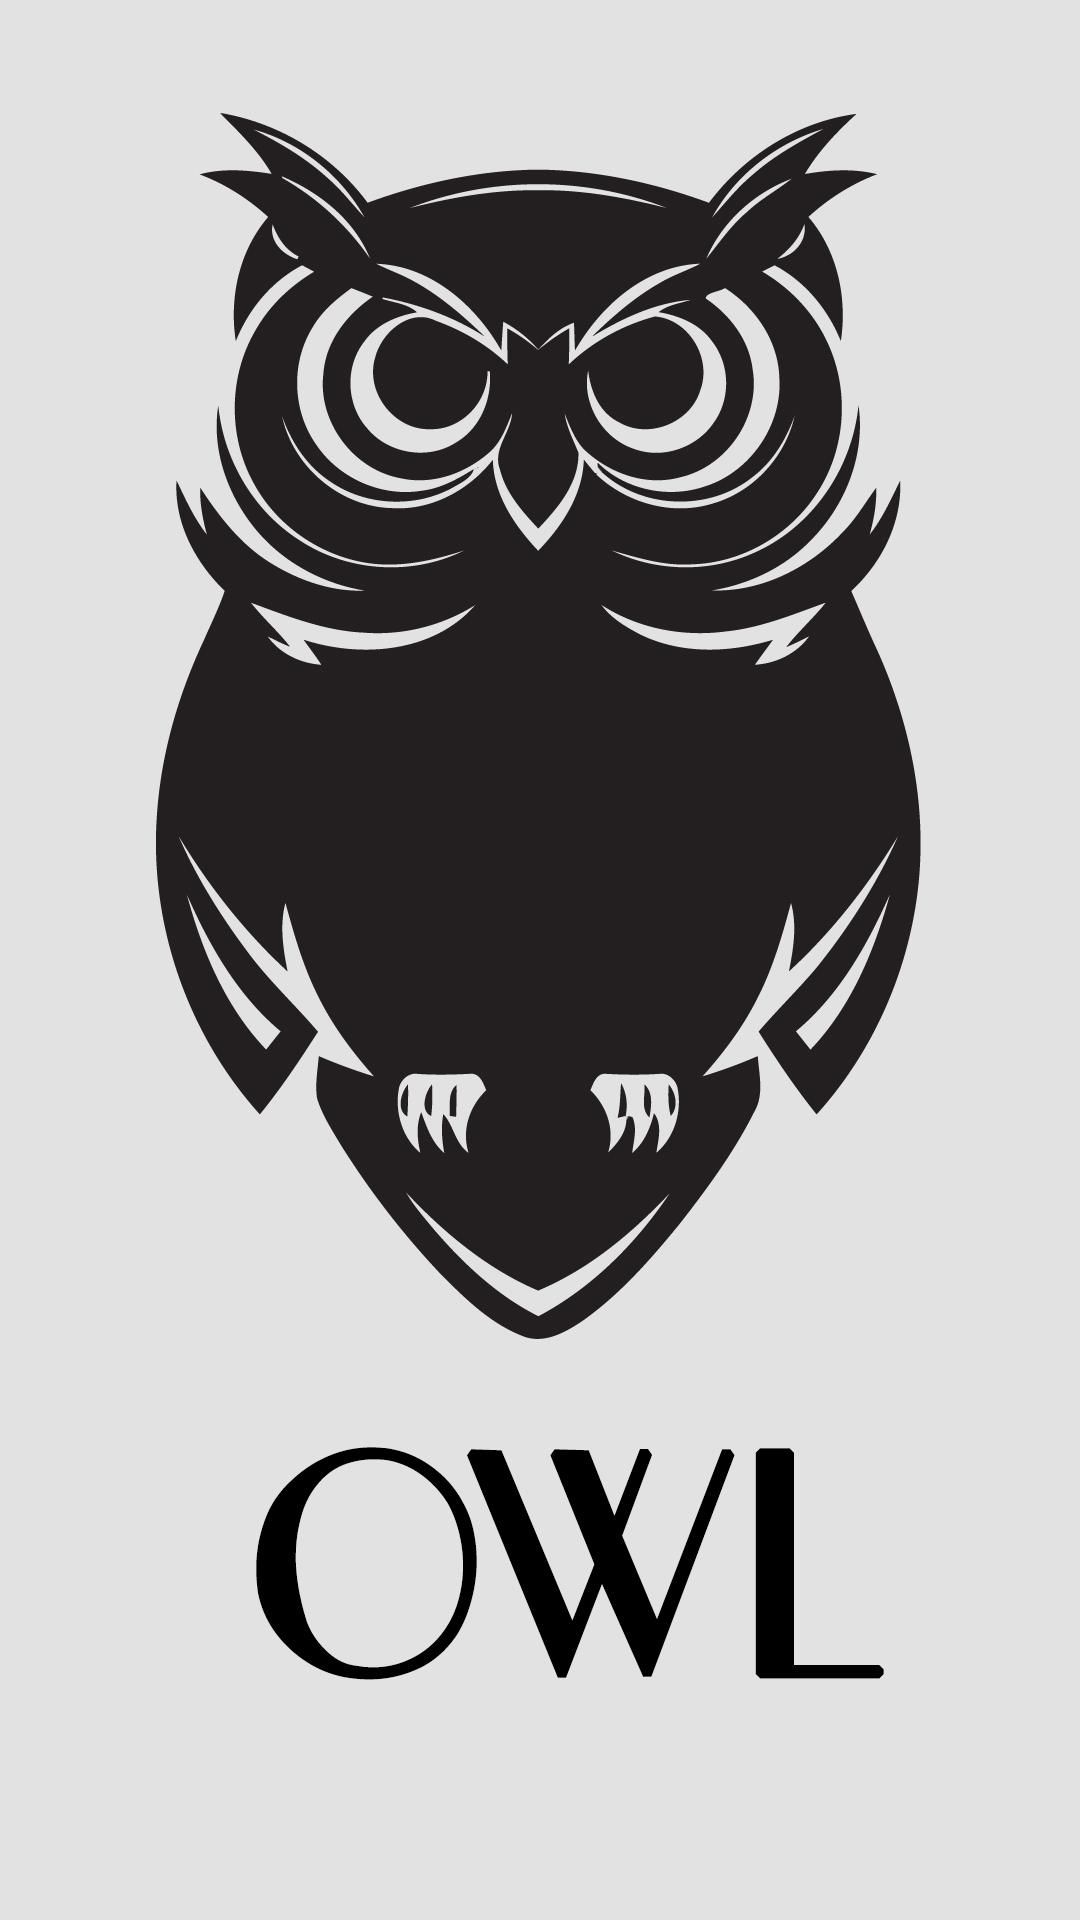 Halloween Fall Iphone Wallpaper Hd Cute Owl Wallpaper For Android Pixelstalk Net